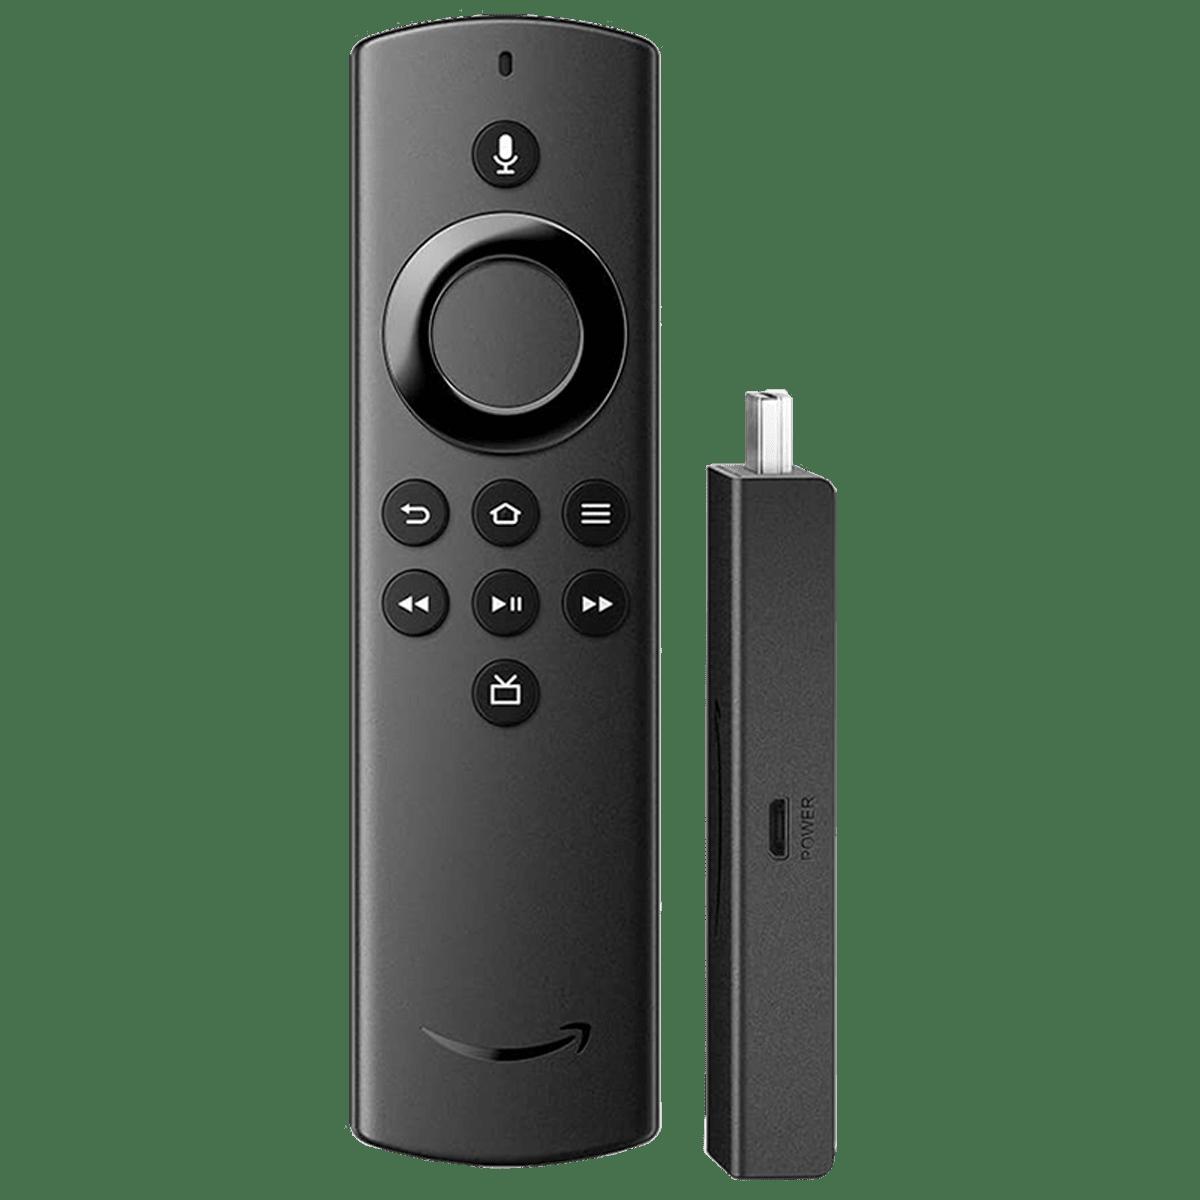 Amazon FireTV Stick Lite With Alexa Voice Remote Lite (Stream HD Quality Video, B07ZZW86G4, Black)